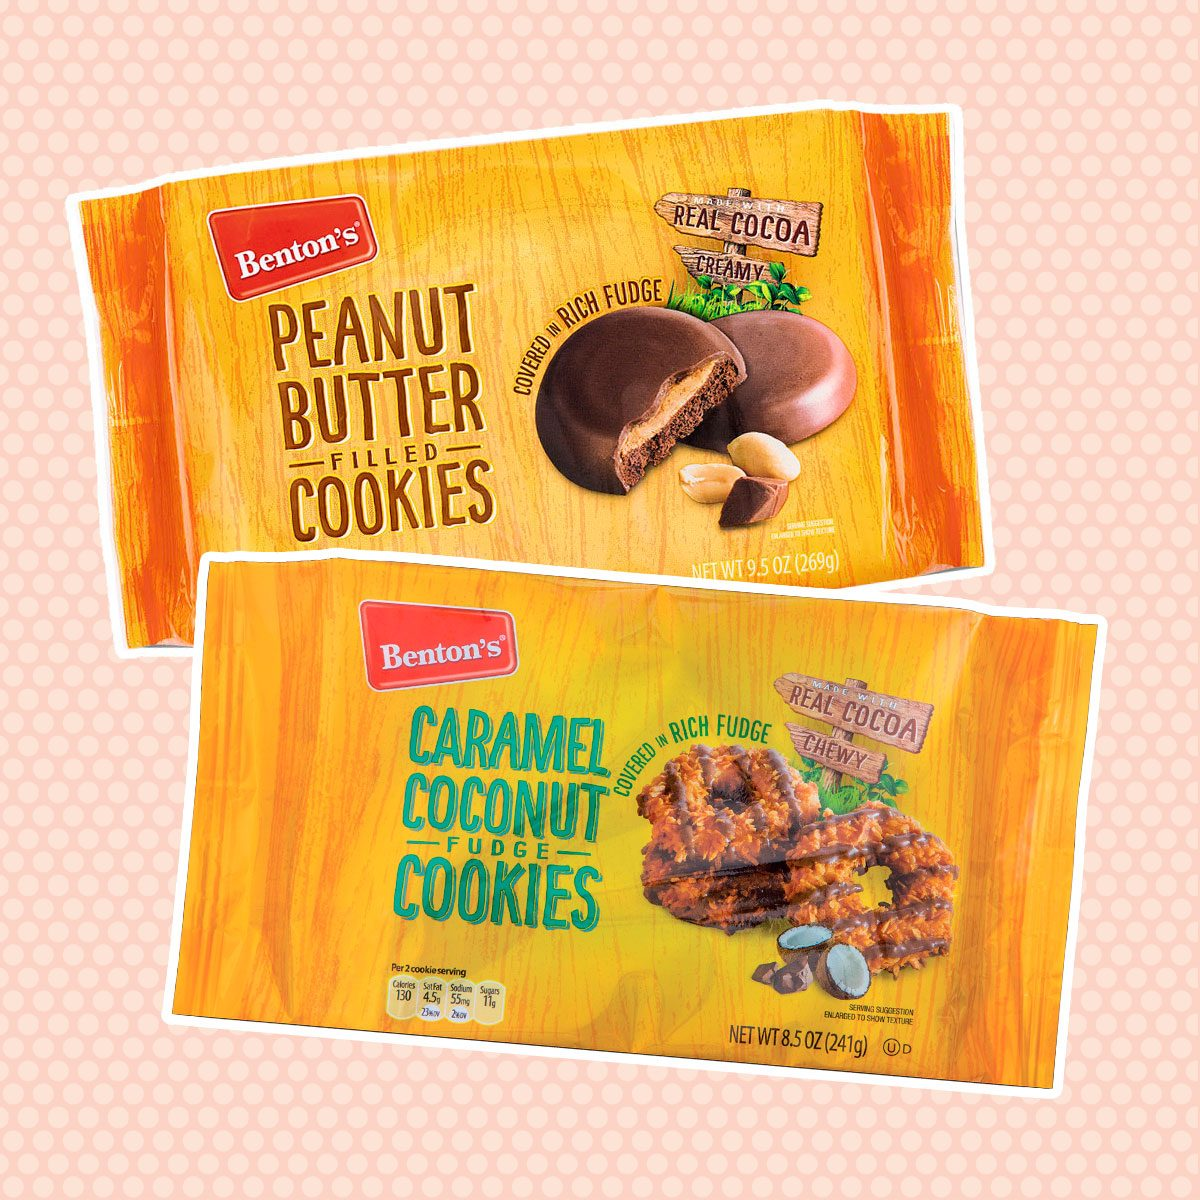 Benton's peanut butter and caramel coconut fudge cookies